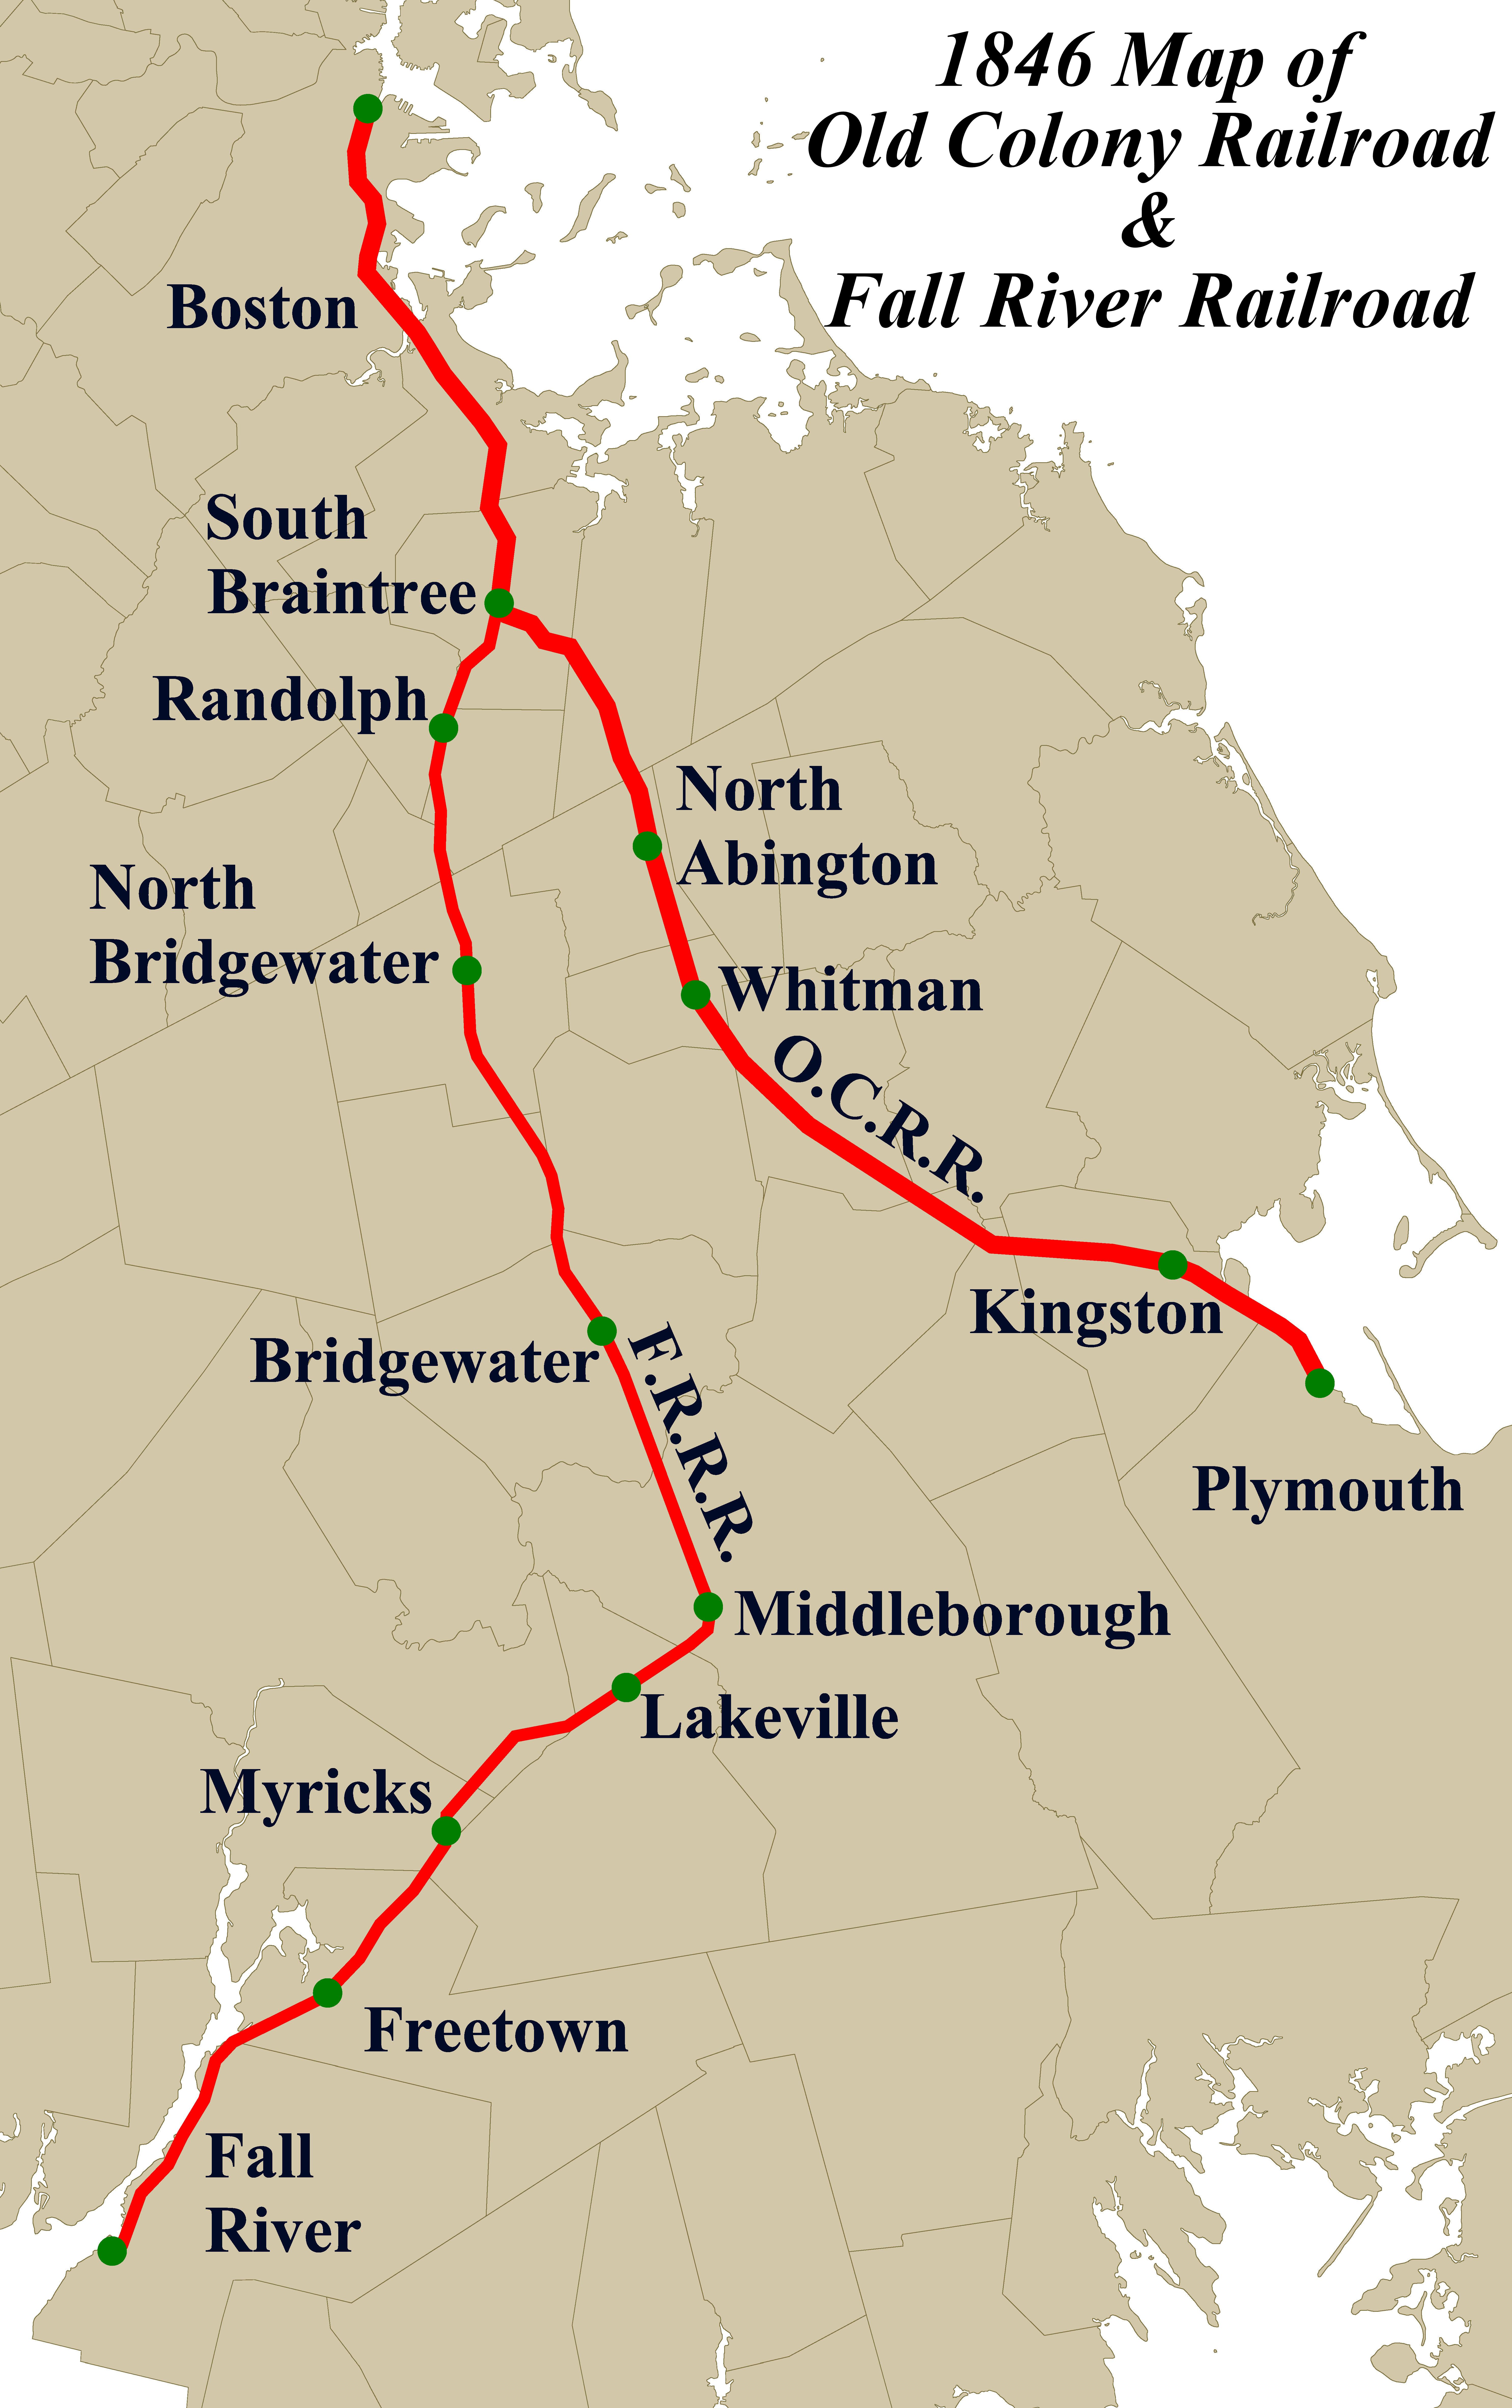 Fall River Railroad (6) - Wikipedia